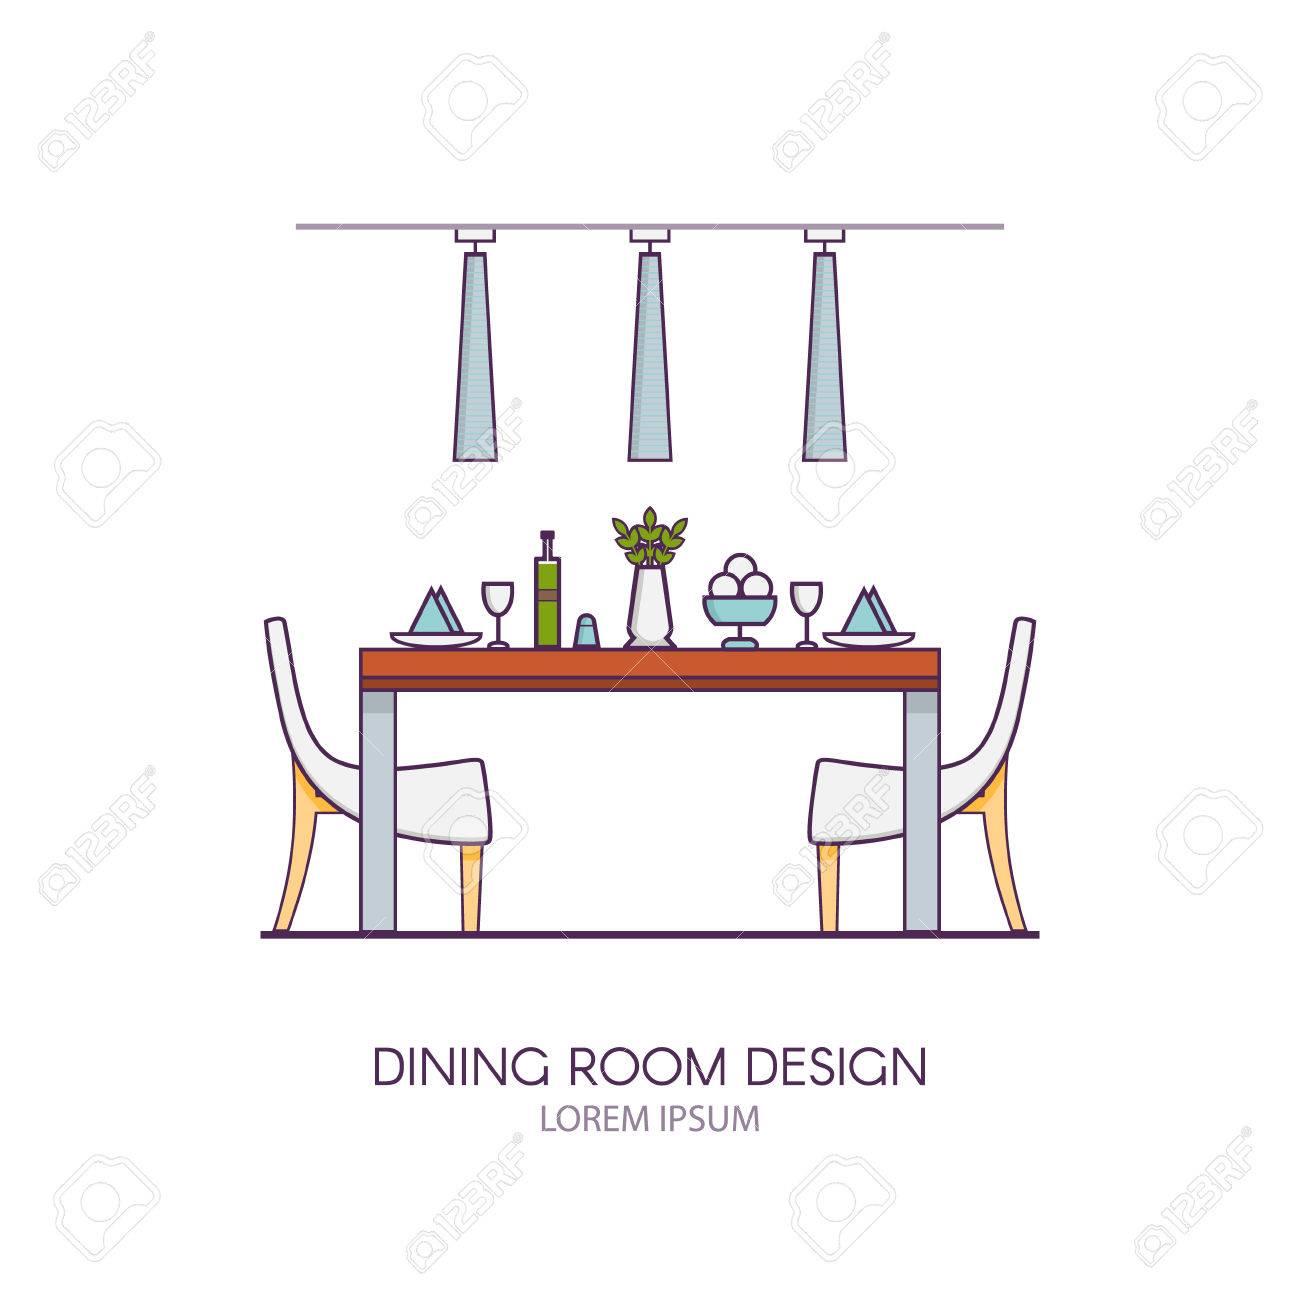 Diseño Moderno Comedor En Estilo Vector Lineal. Concepto De Entre ...